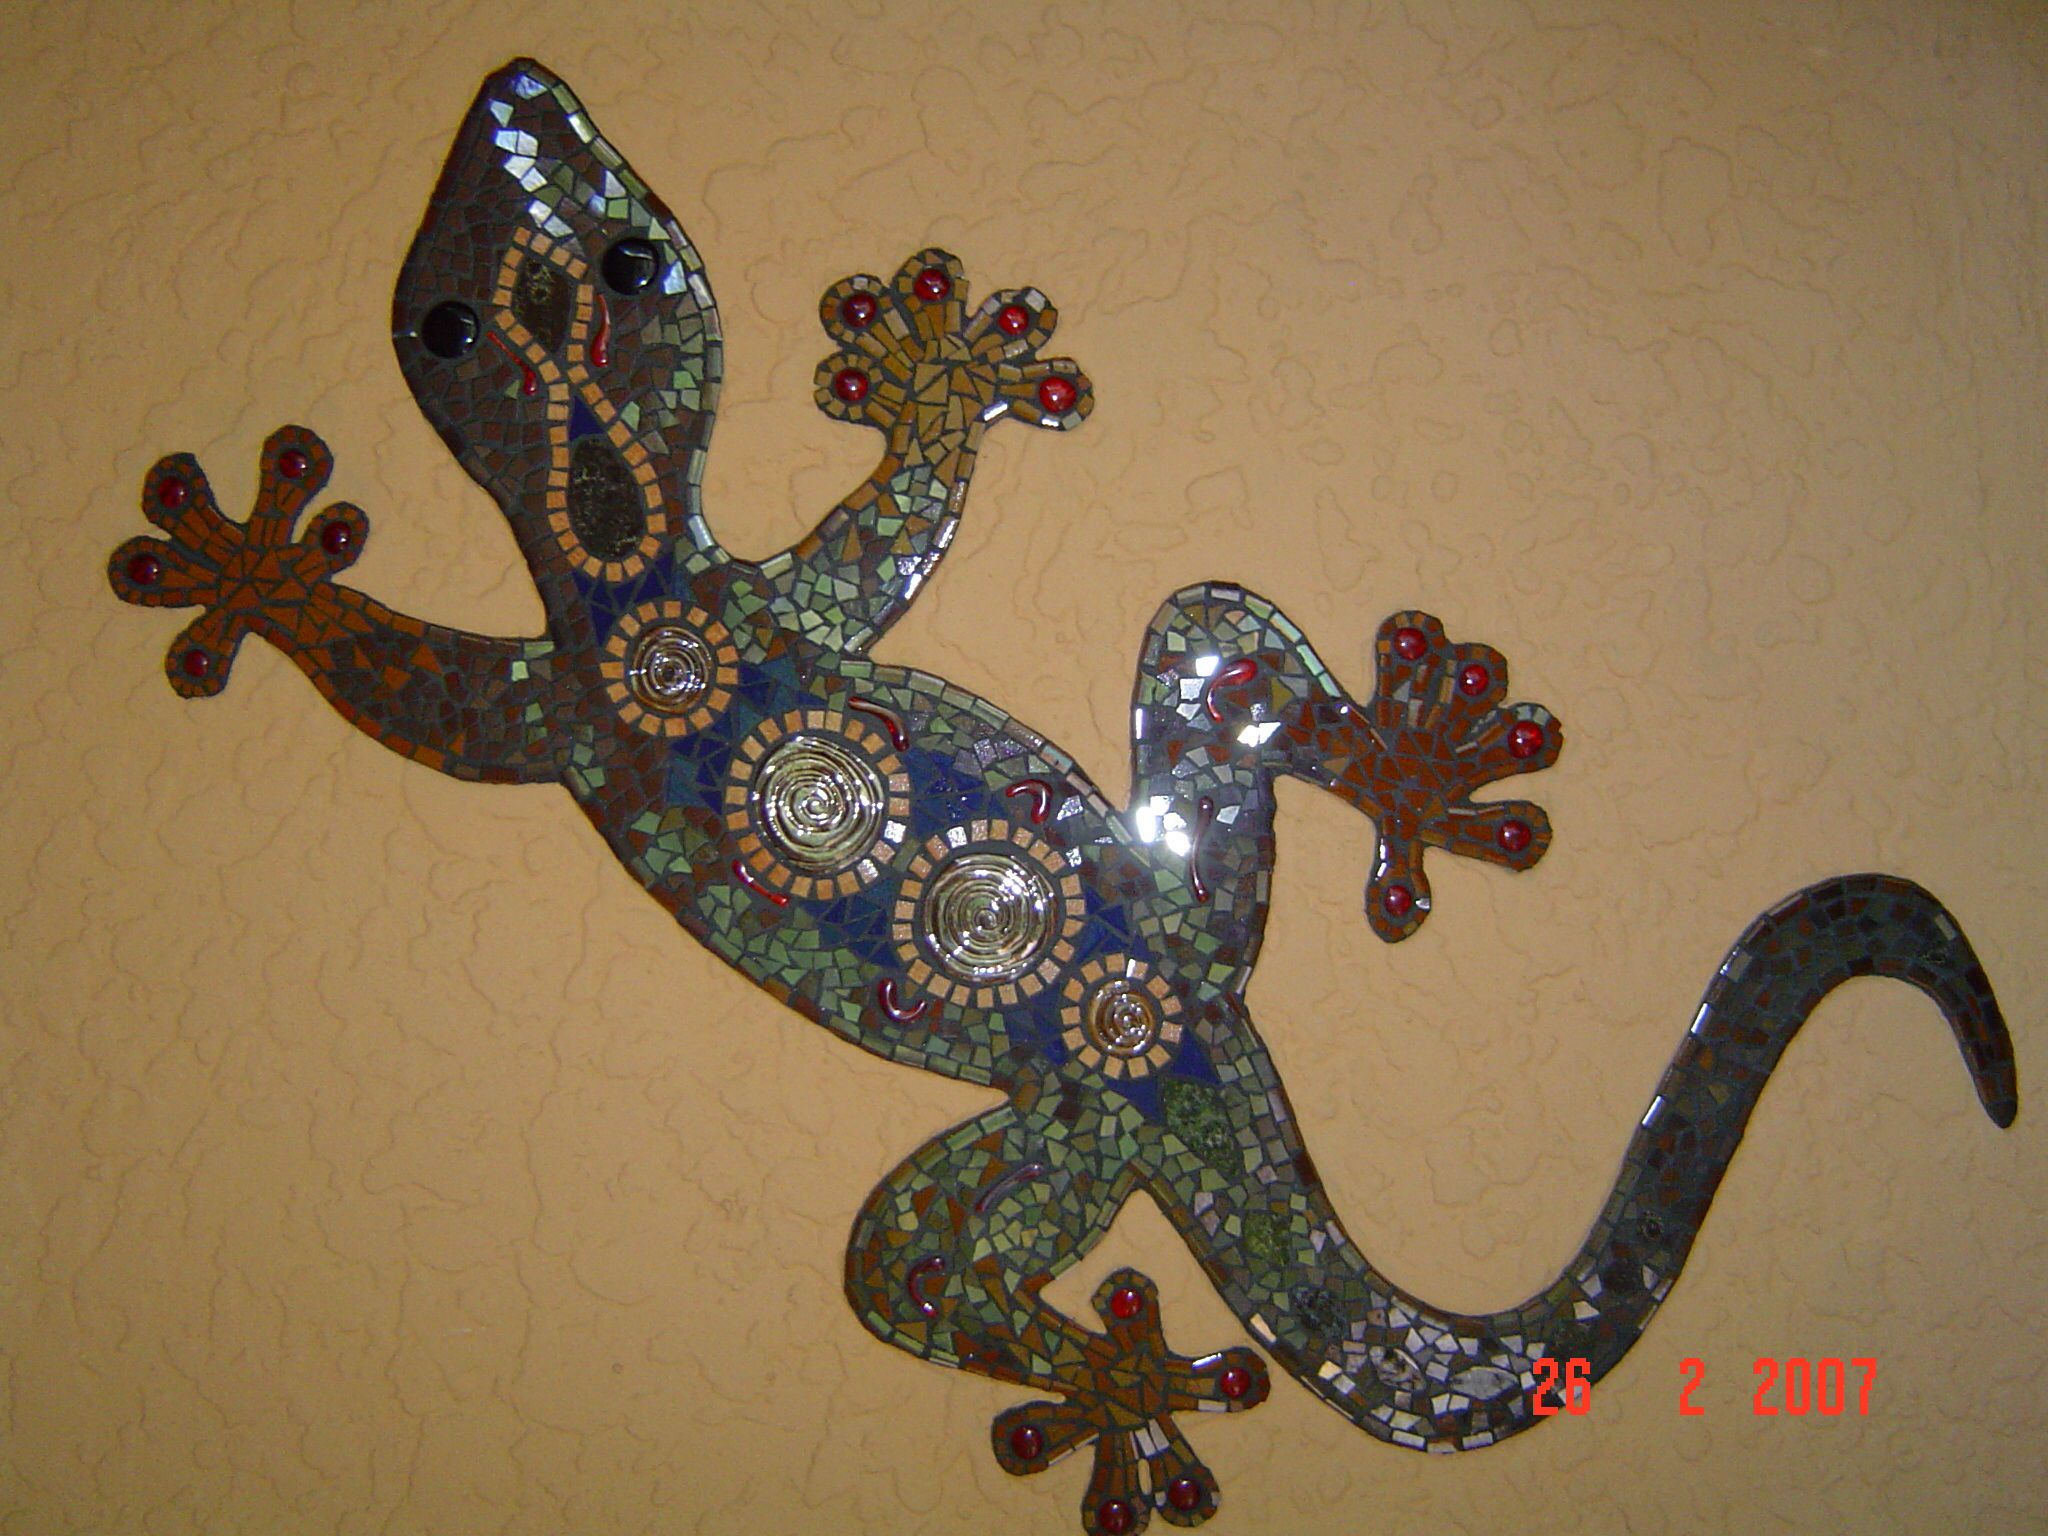 Mosaic lizard by lisa bus art studio lisa bus art studio mosaic